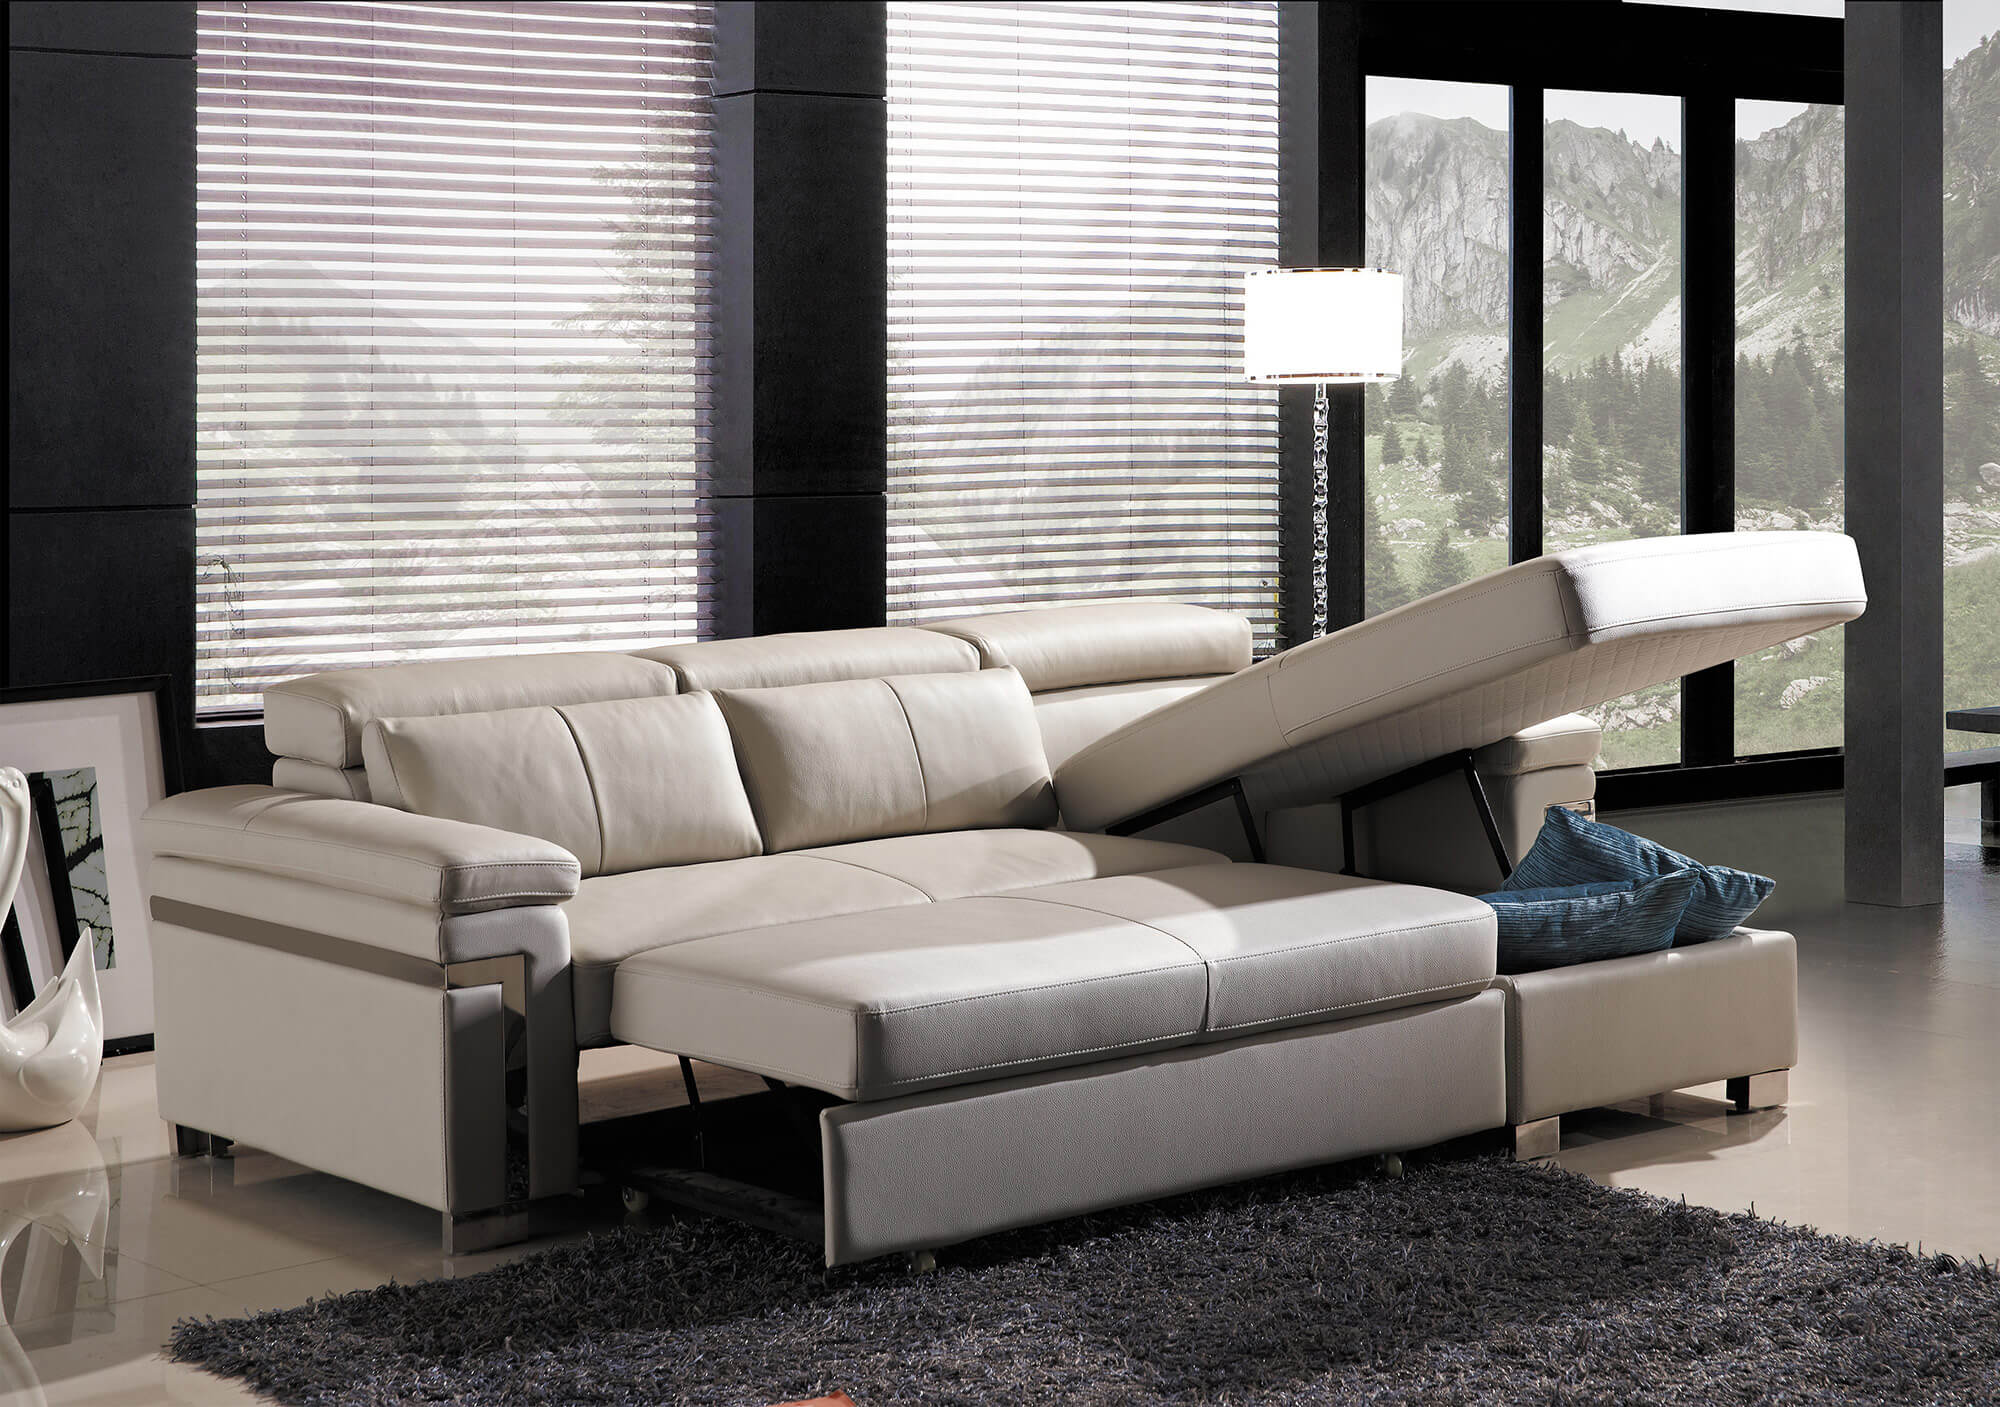 sylvia sofa bed